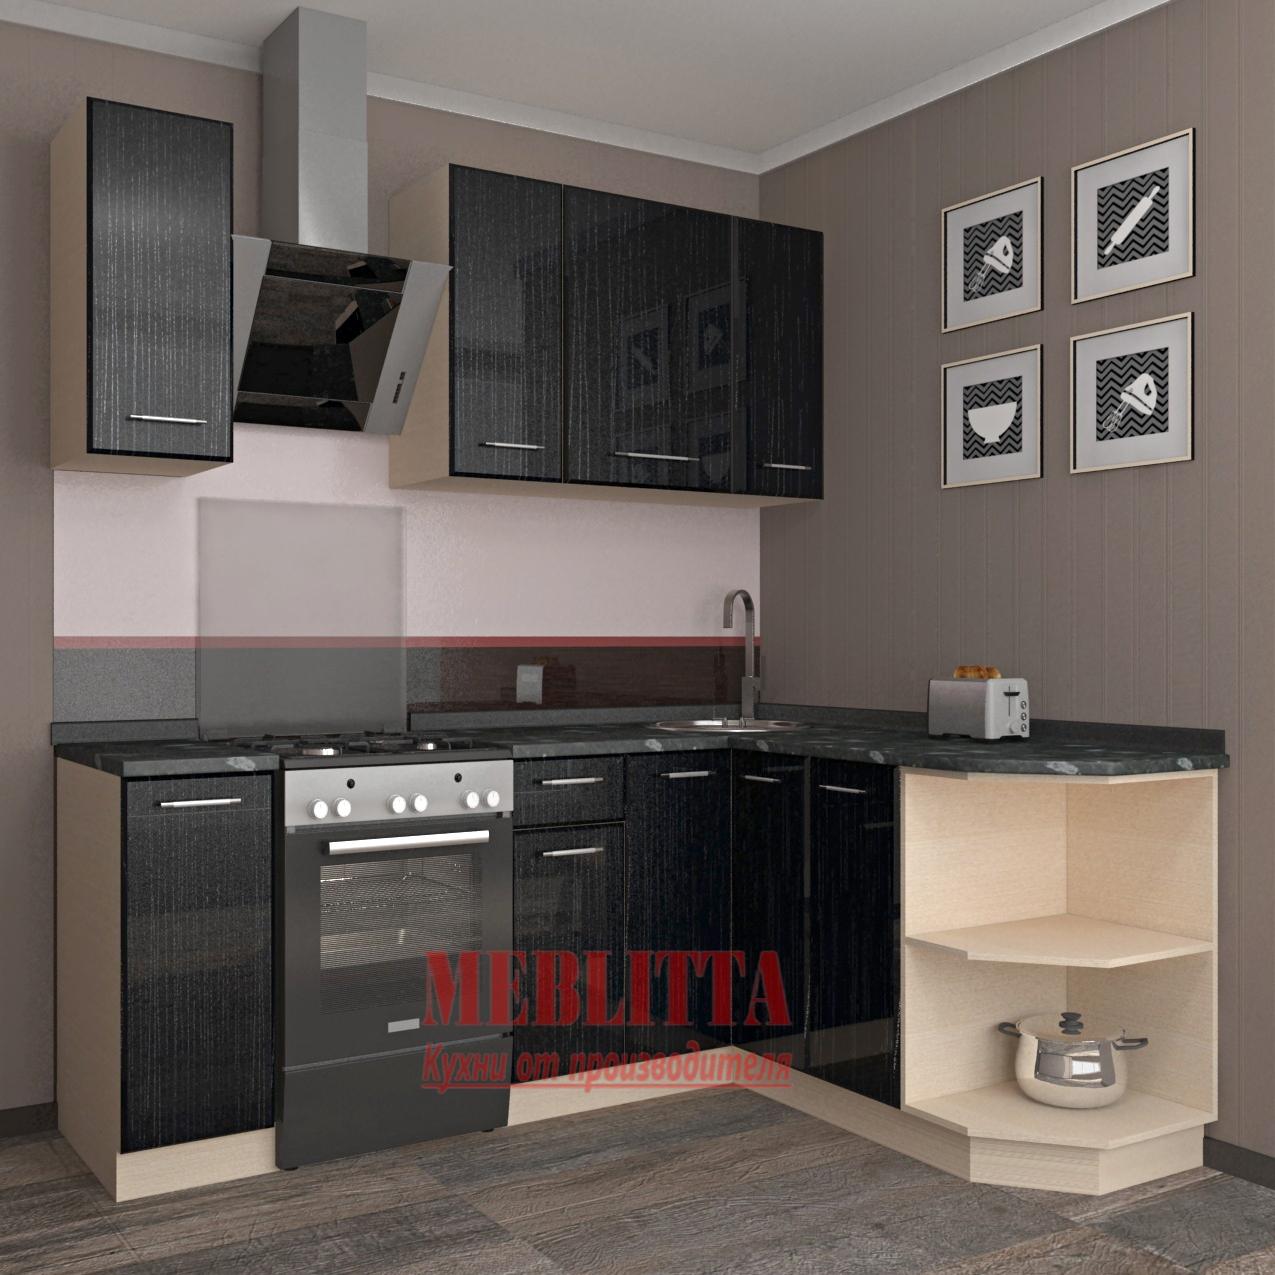 Каталог кухонь с фасадами из пластика